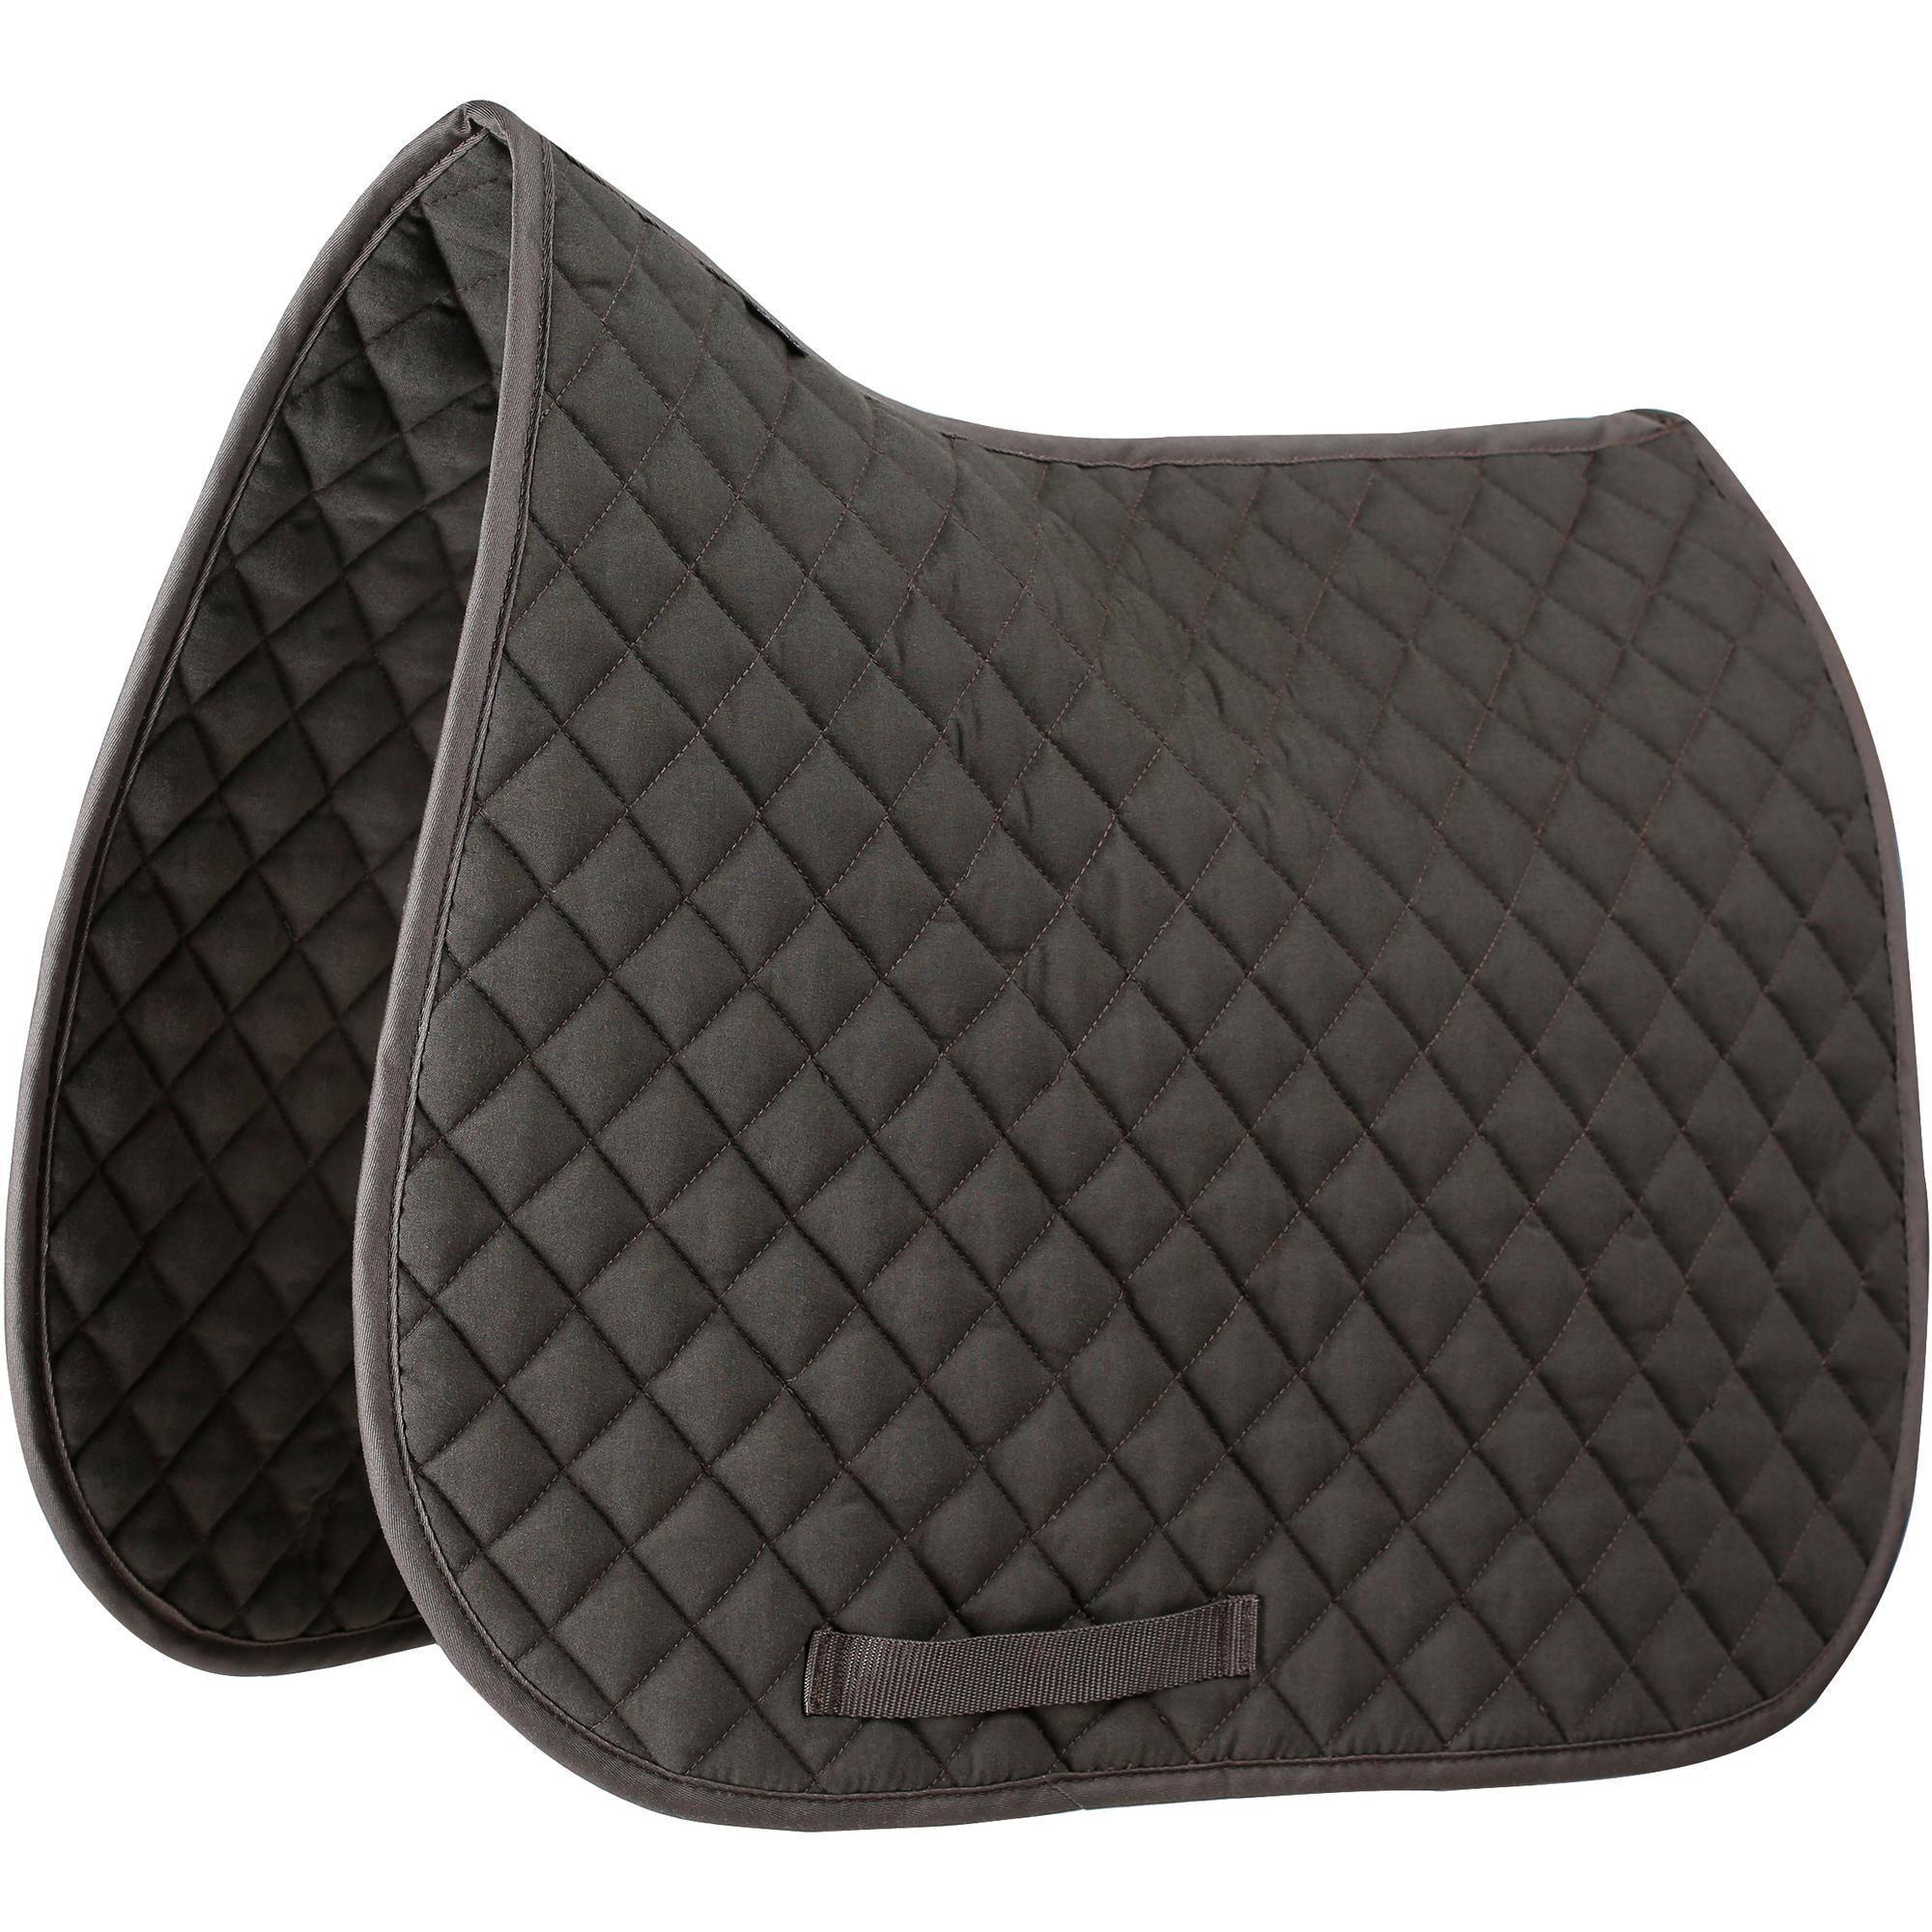 tapis de selle quitation poney et cheval schooling marron. Black Bedroom Furniture Sets. Home Design Ideas